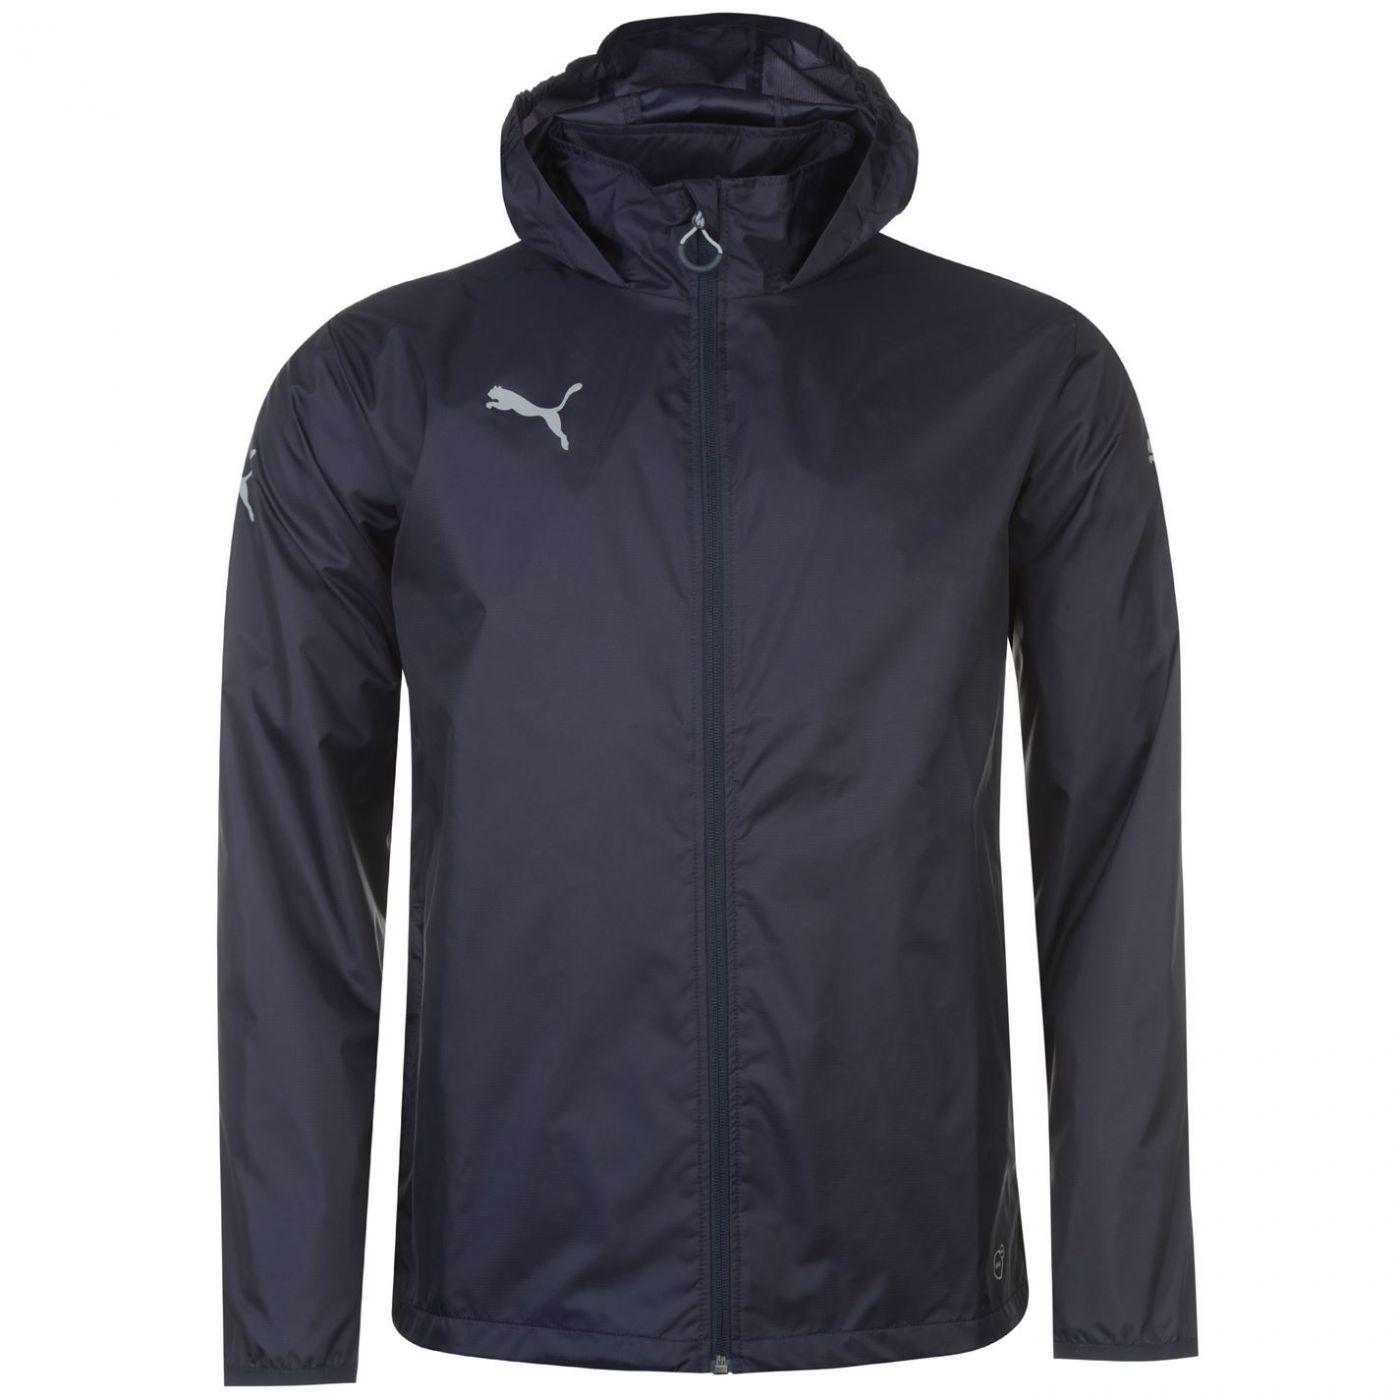 Men's jacket Puma Essential Rain Jacket